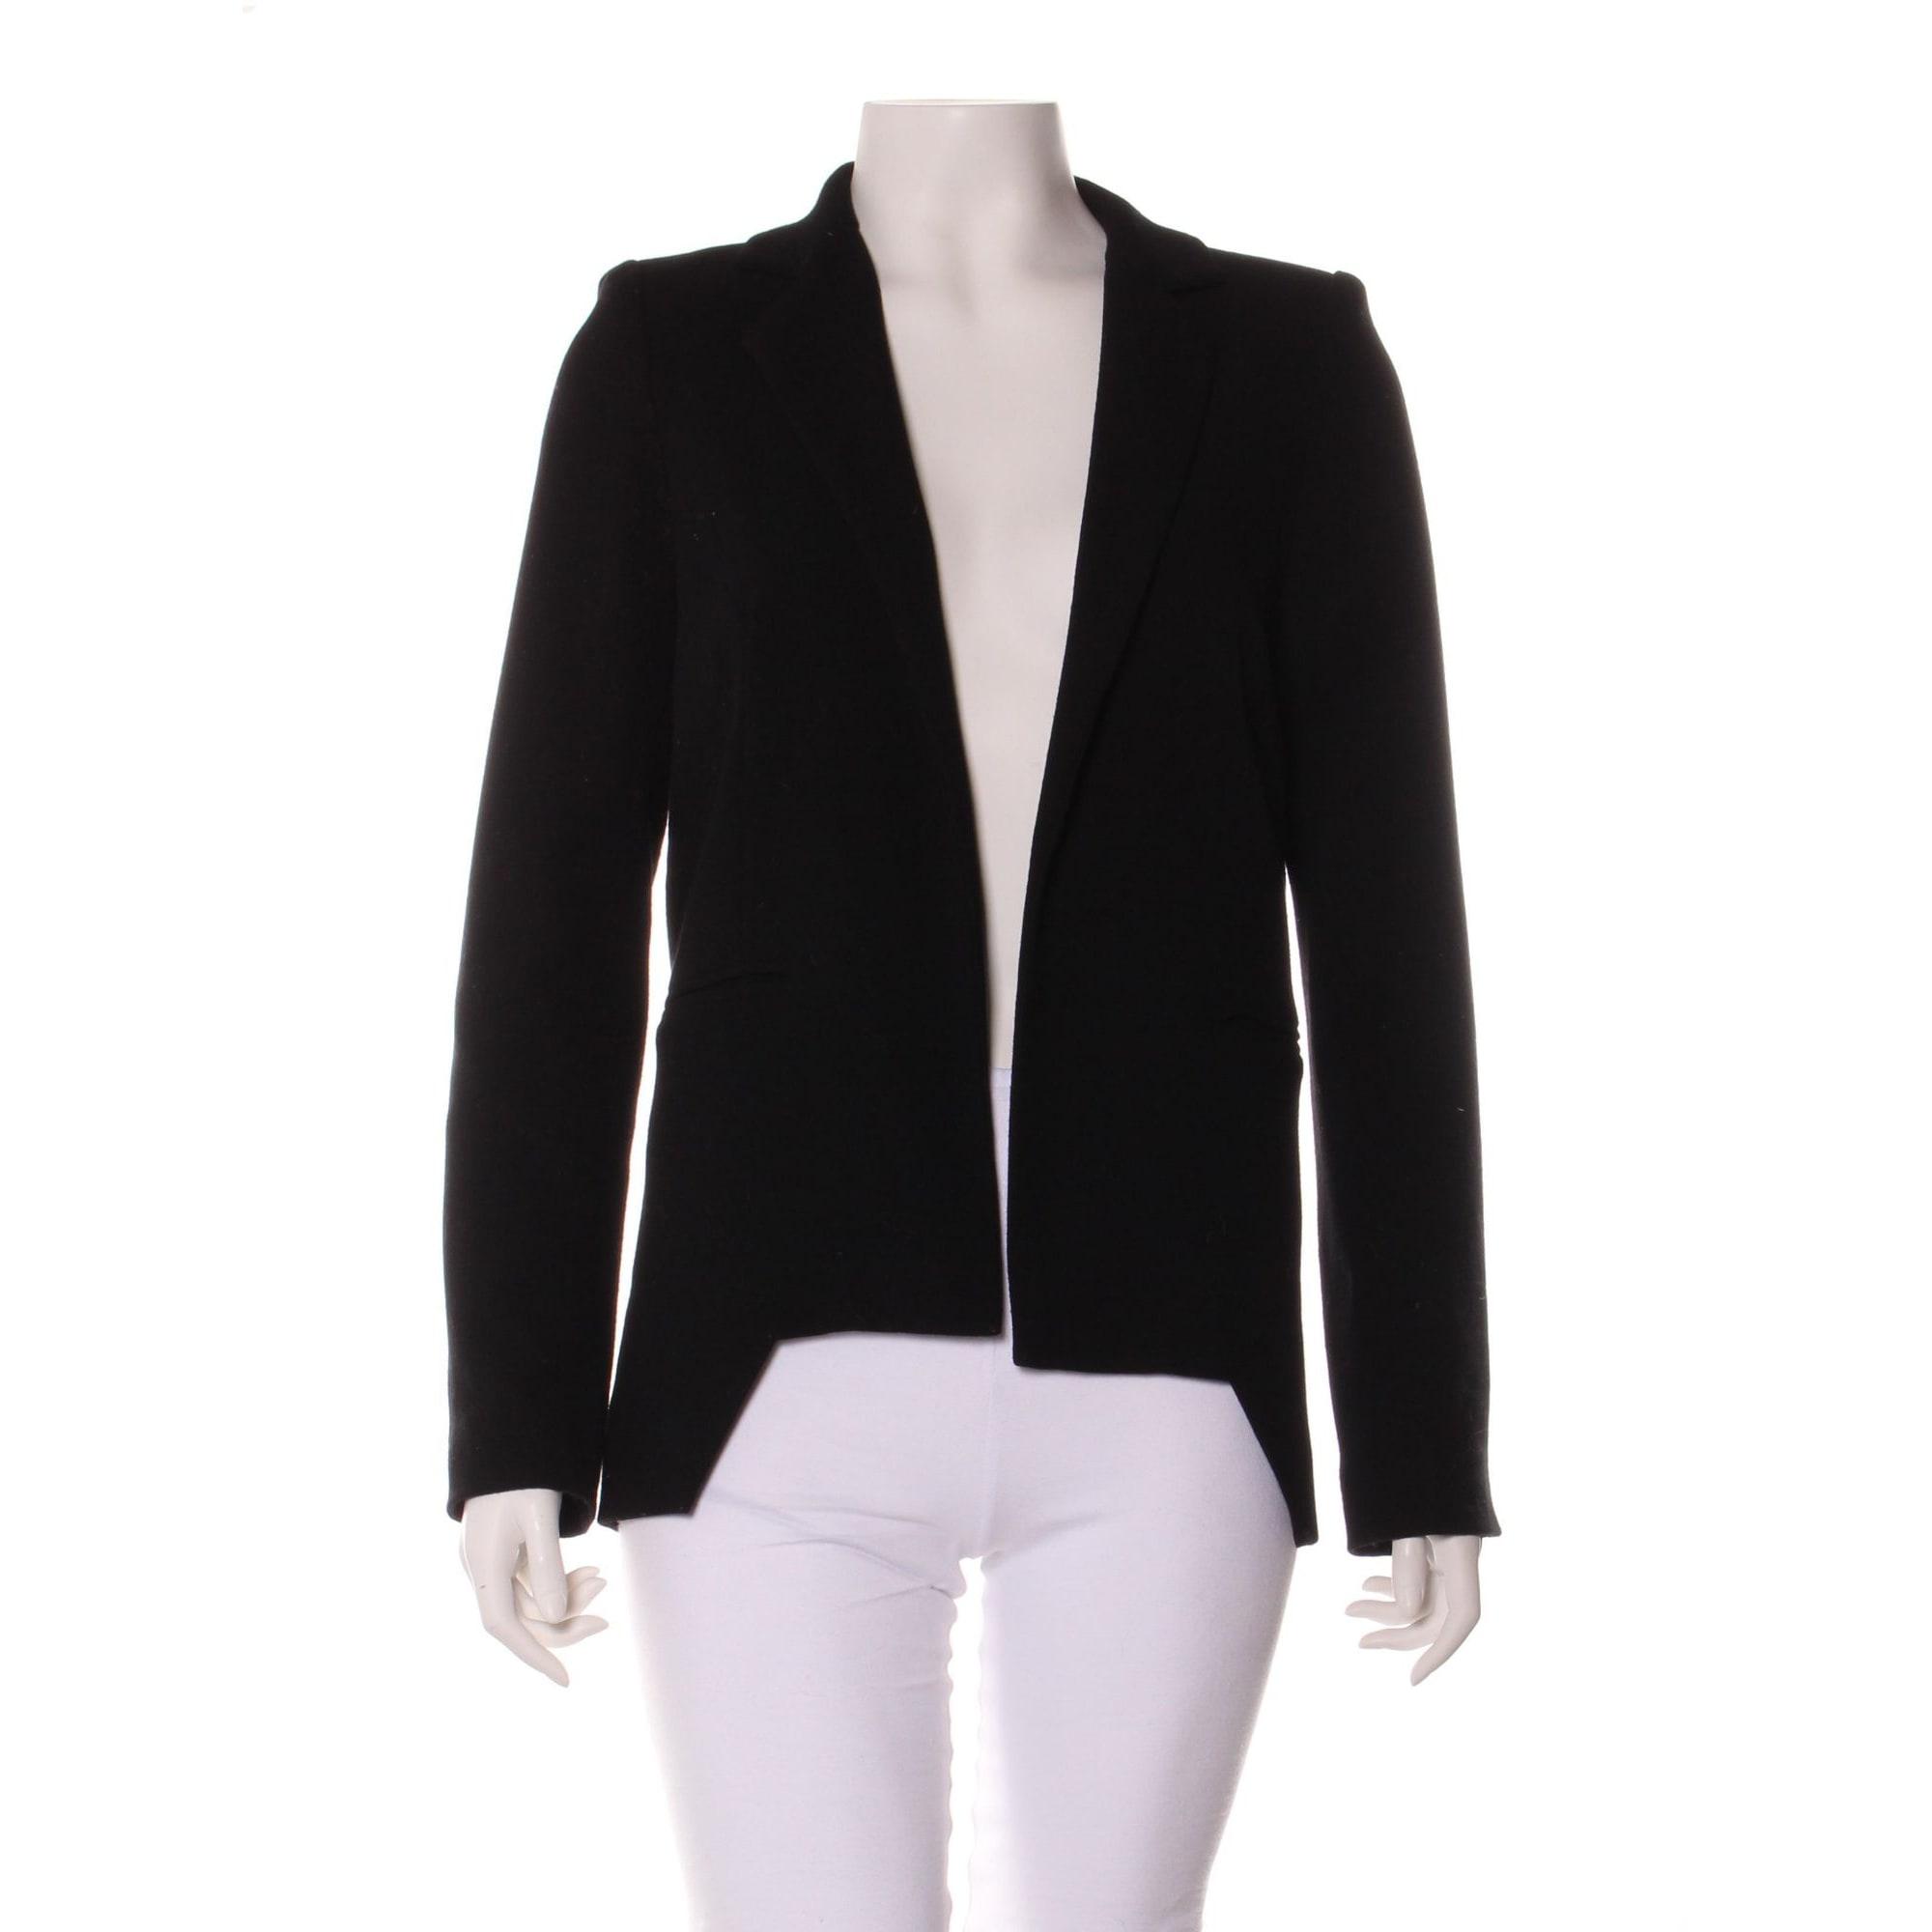 Blazer, veste tailleur BEL AIR Noir